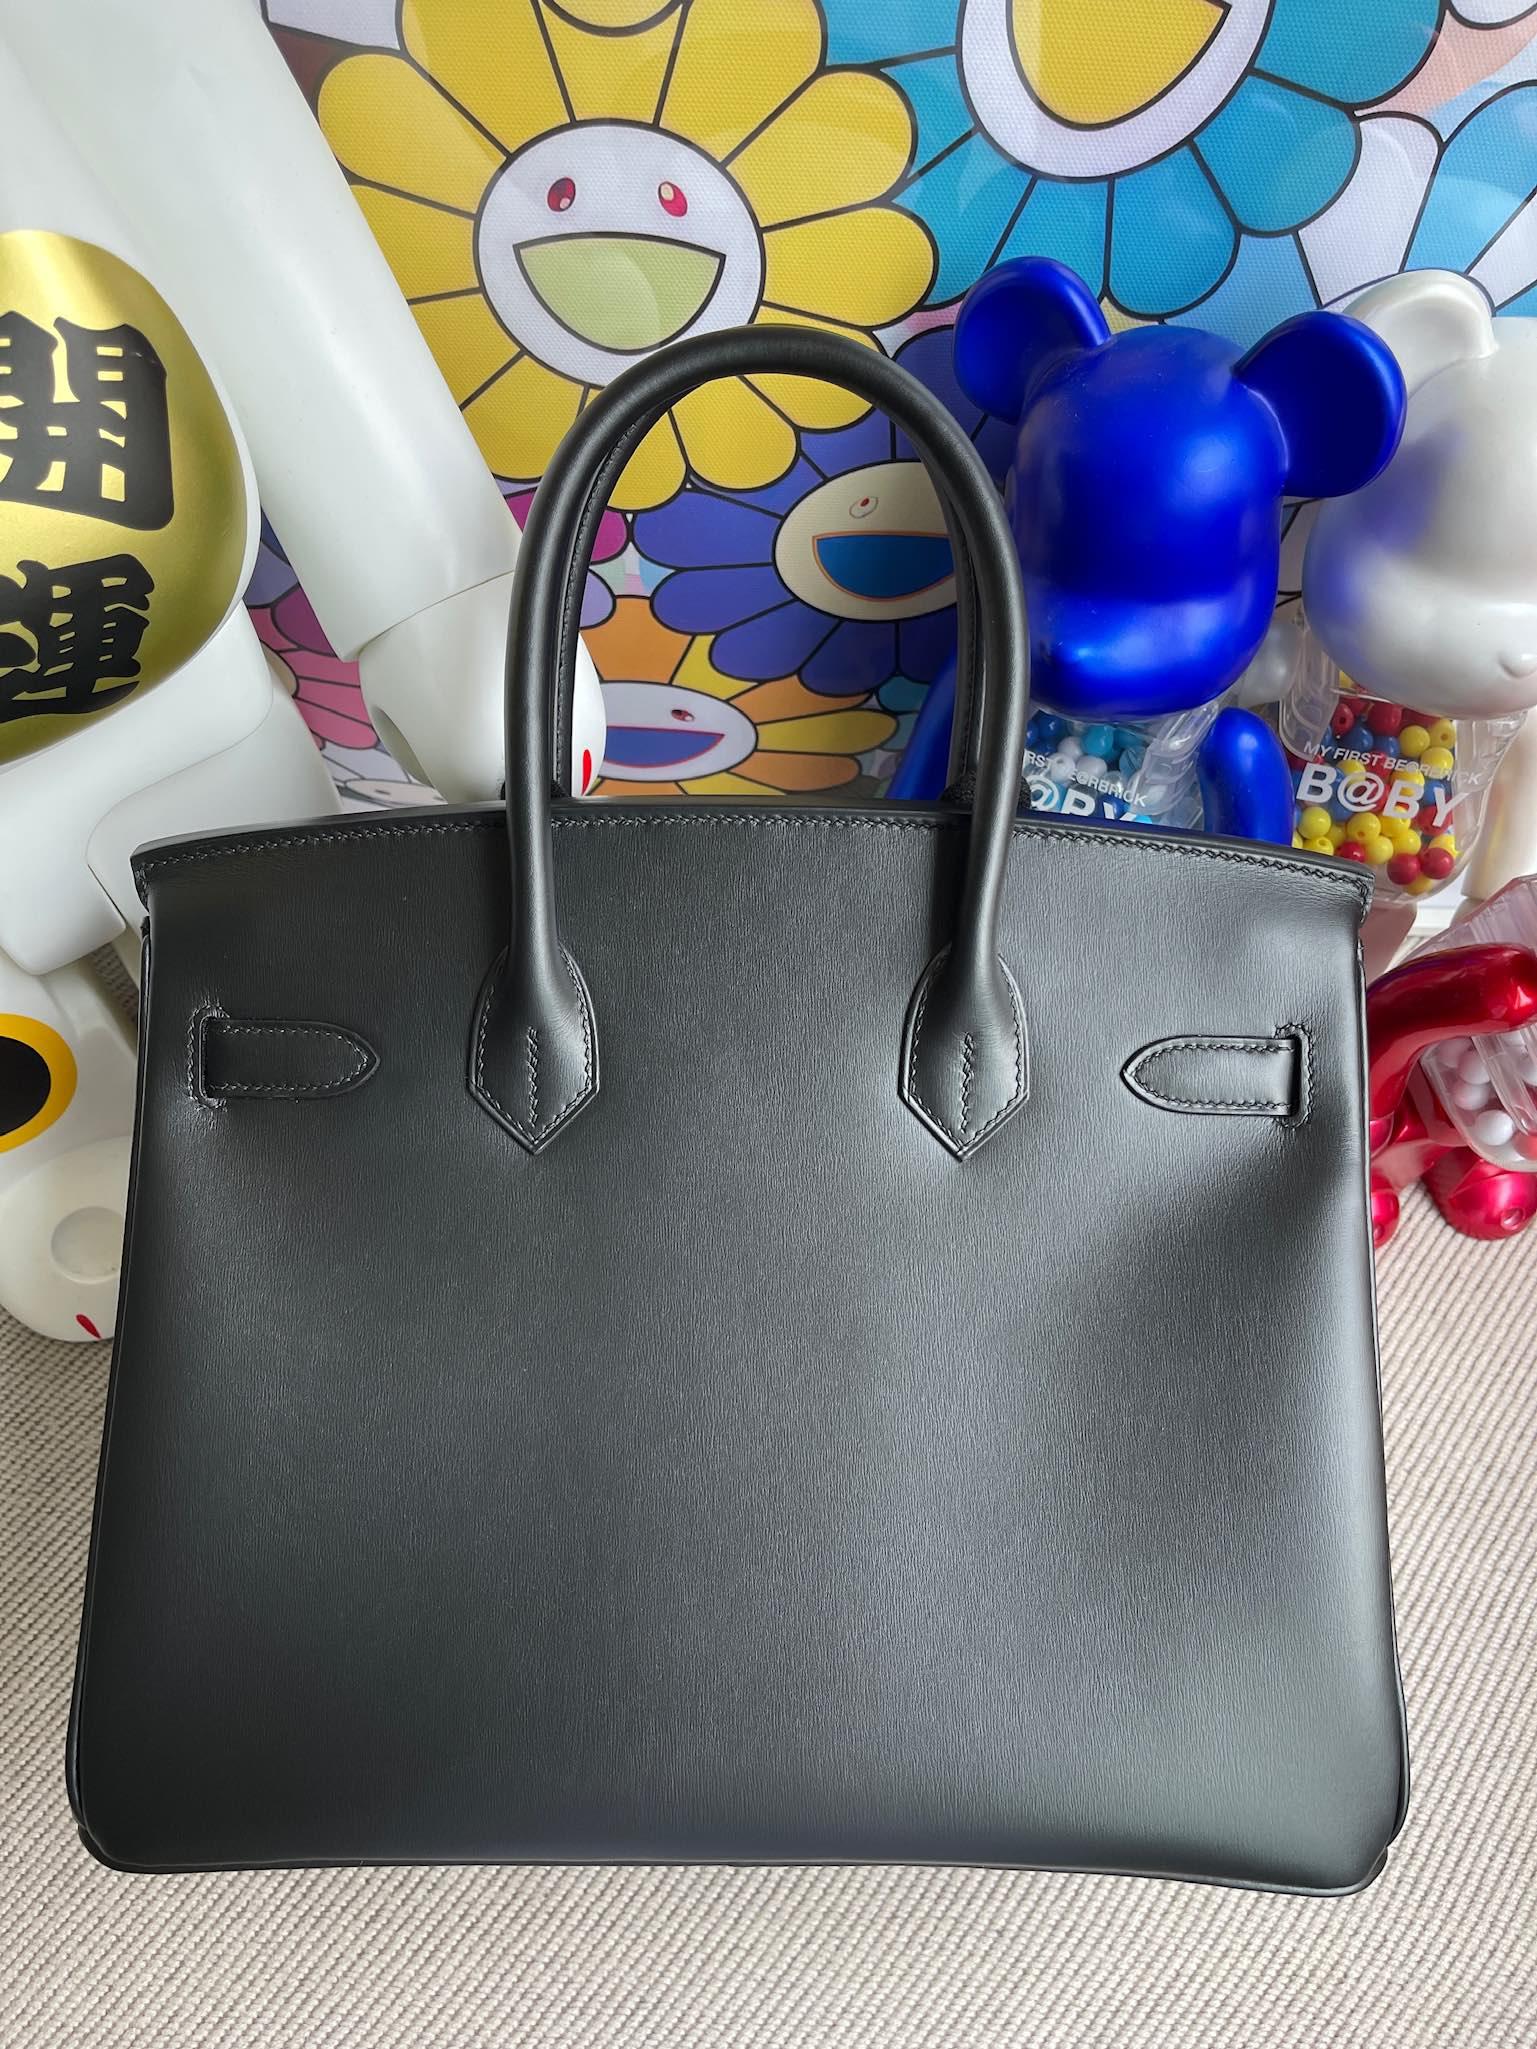 Hermès(爱马仕)Birkin 铂金包 Boxcalf ck89 黑色 noir 黑扣 So black 30cm 顶级手缝